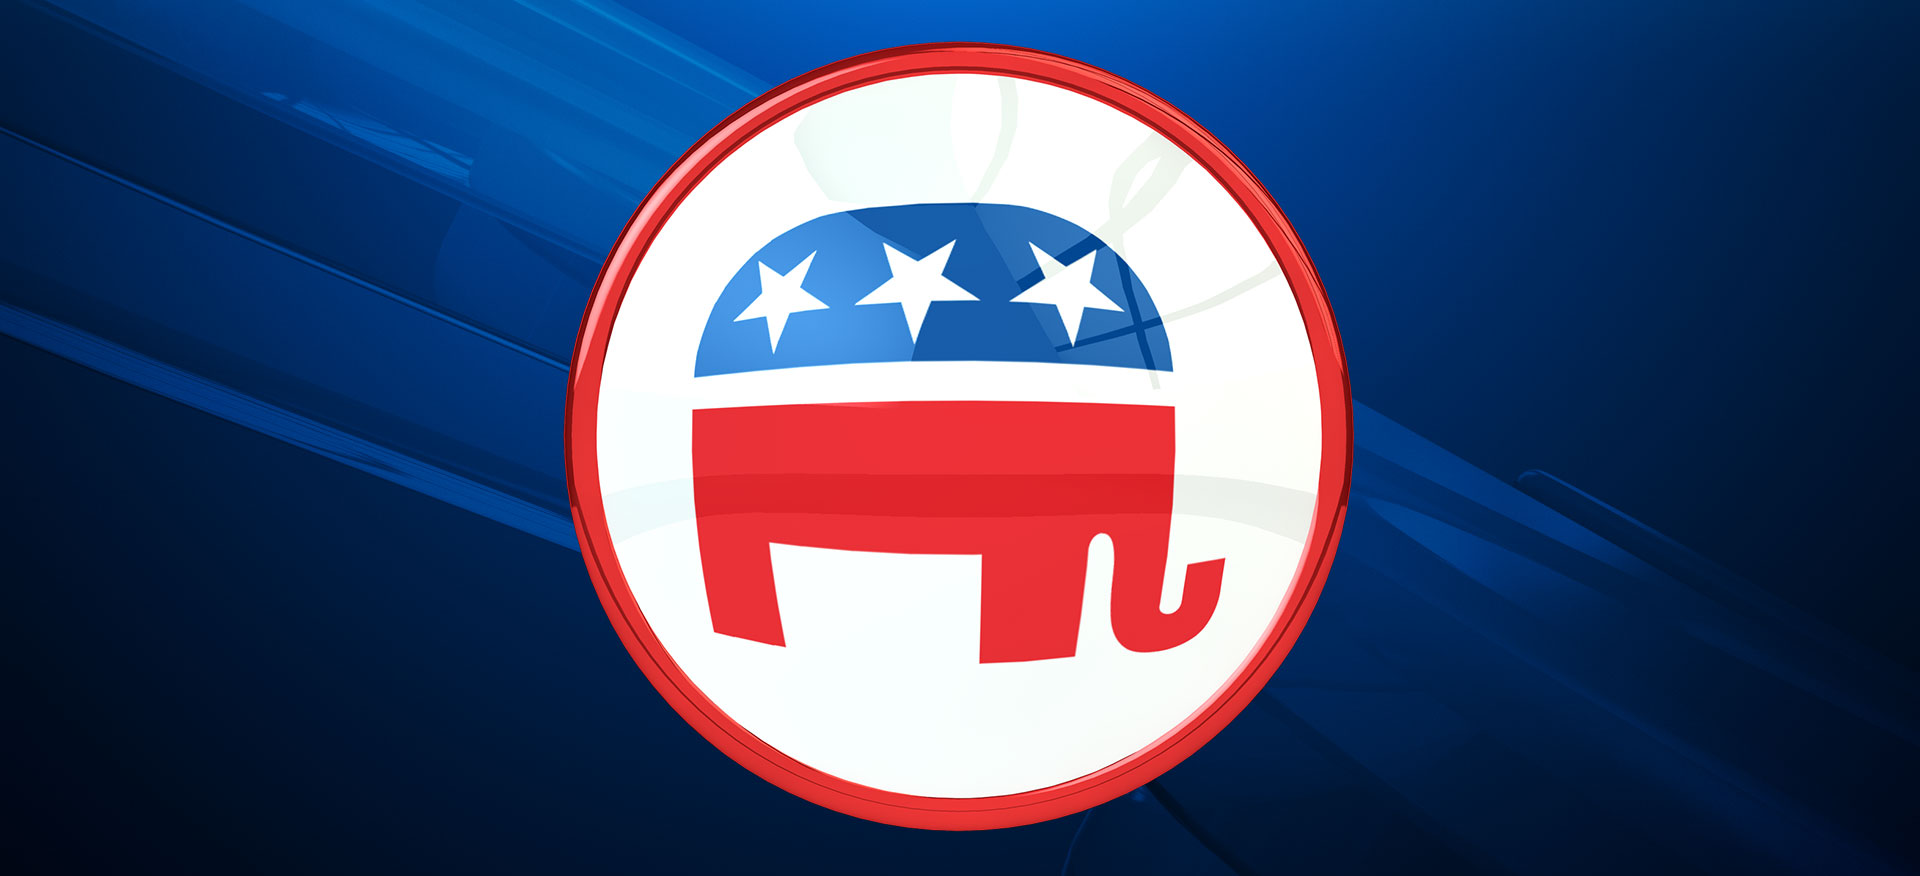 GOP Republican party